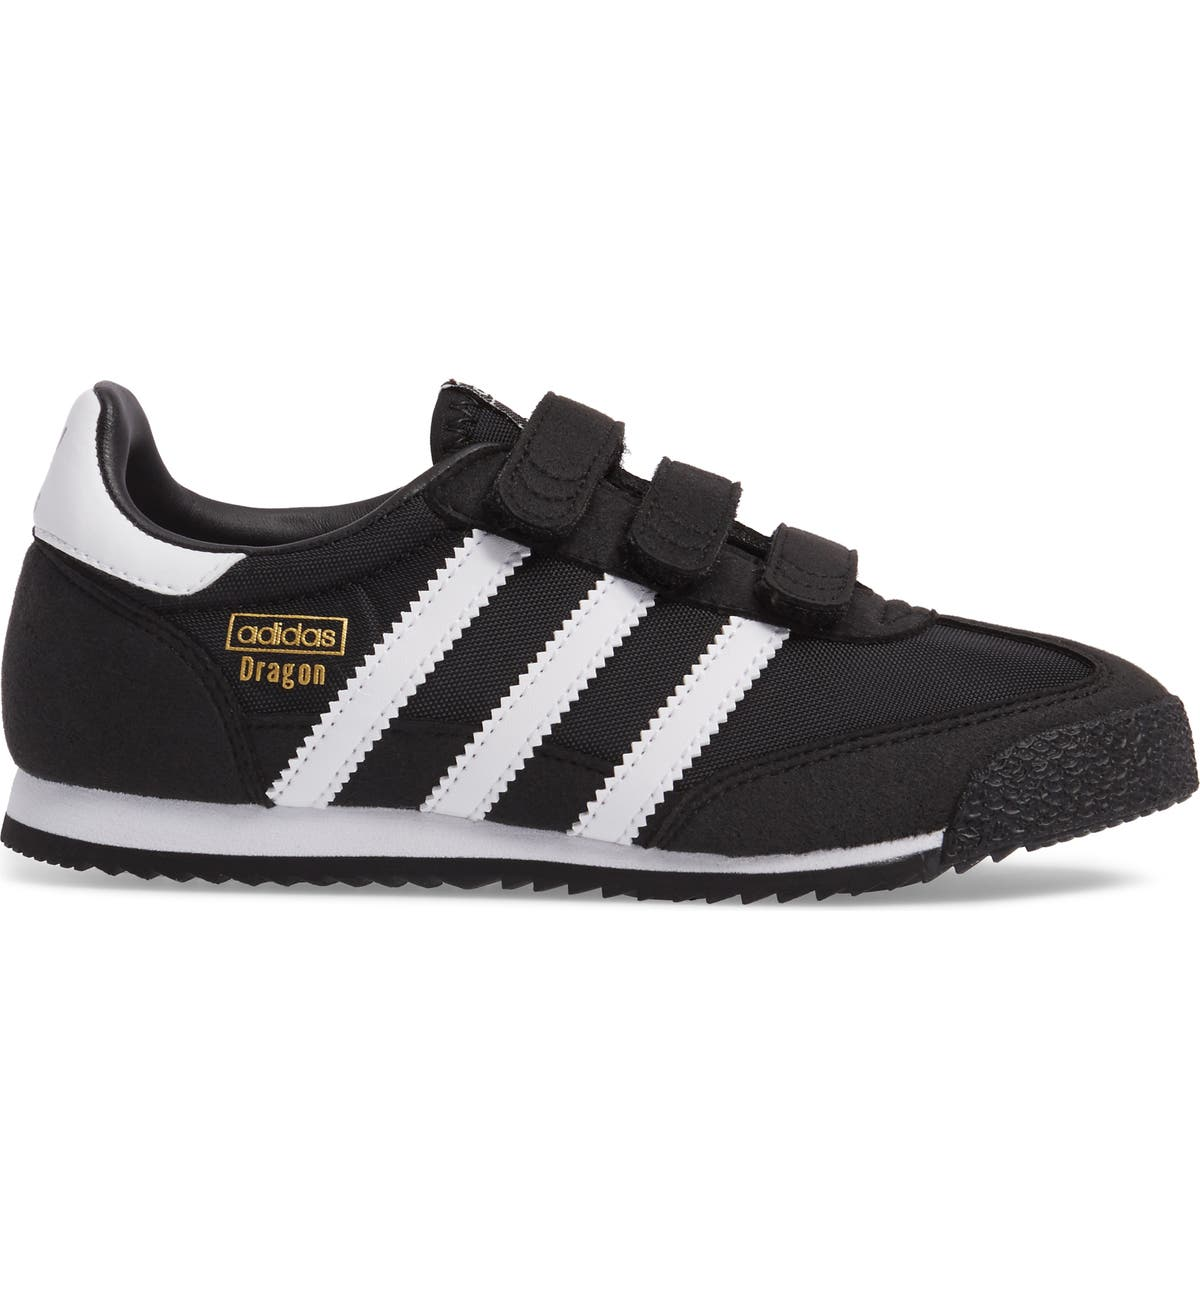 buy online 06448 05ae6 adidas Dragon OG CF Athletic Shoe (Toddler  Little Kid)  Nor